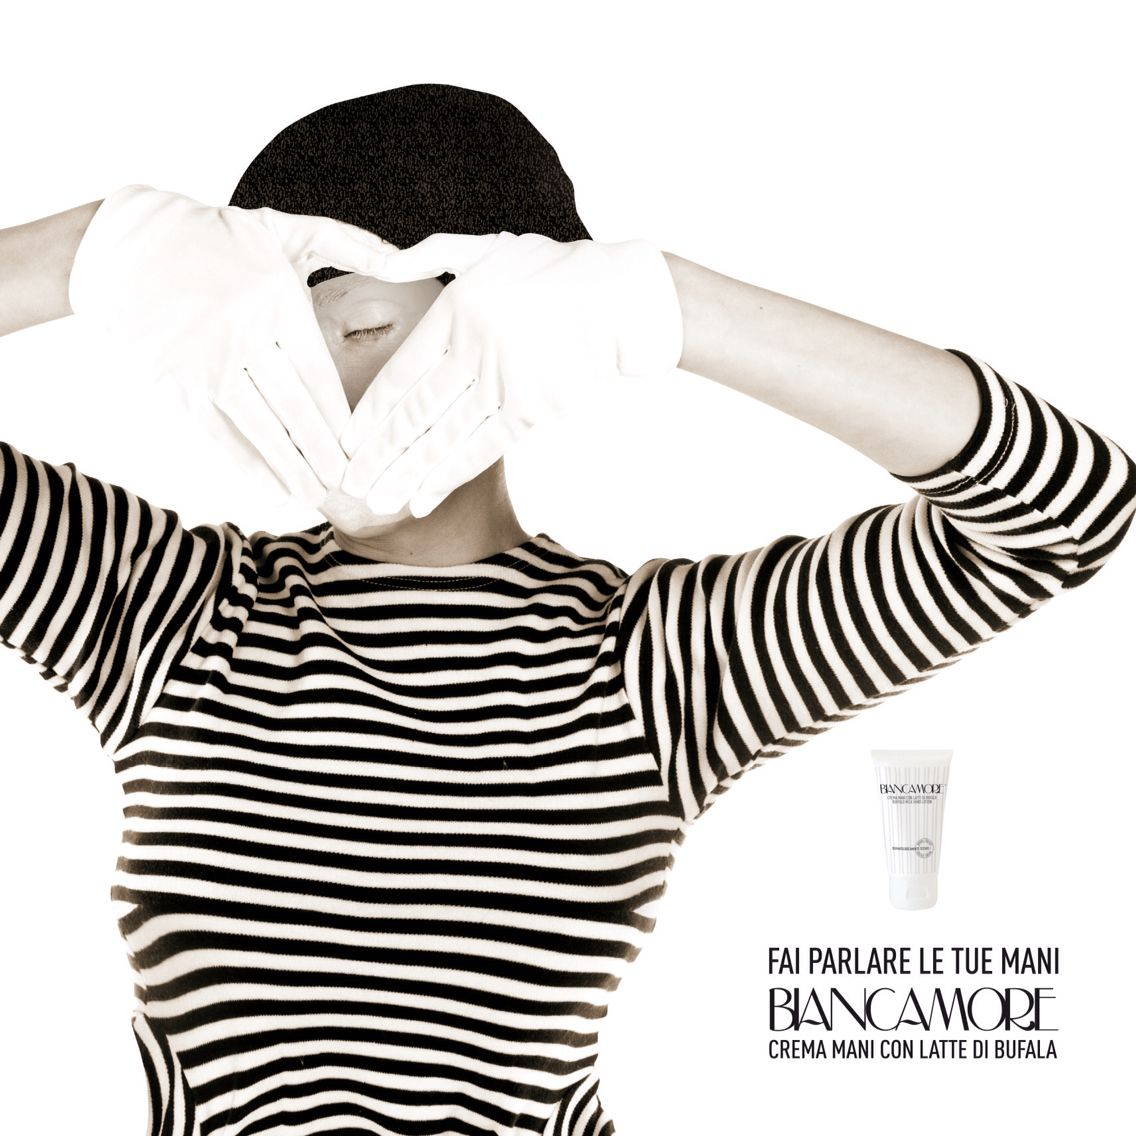 Crema mani Biancamore - adv